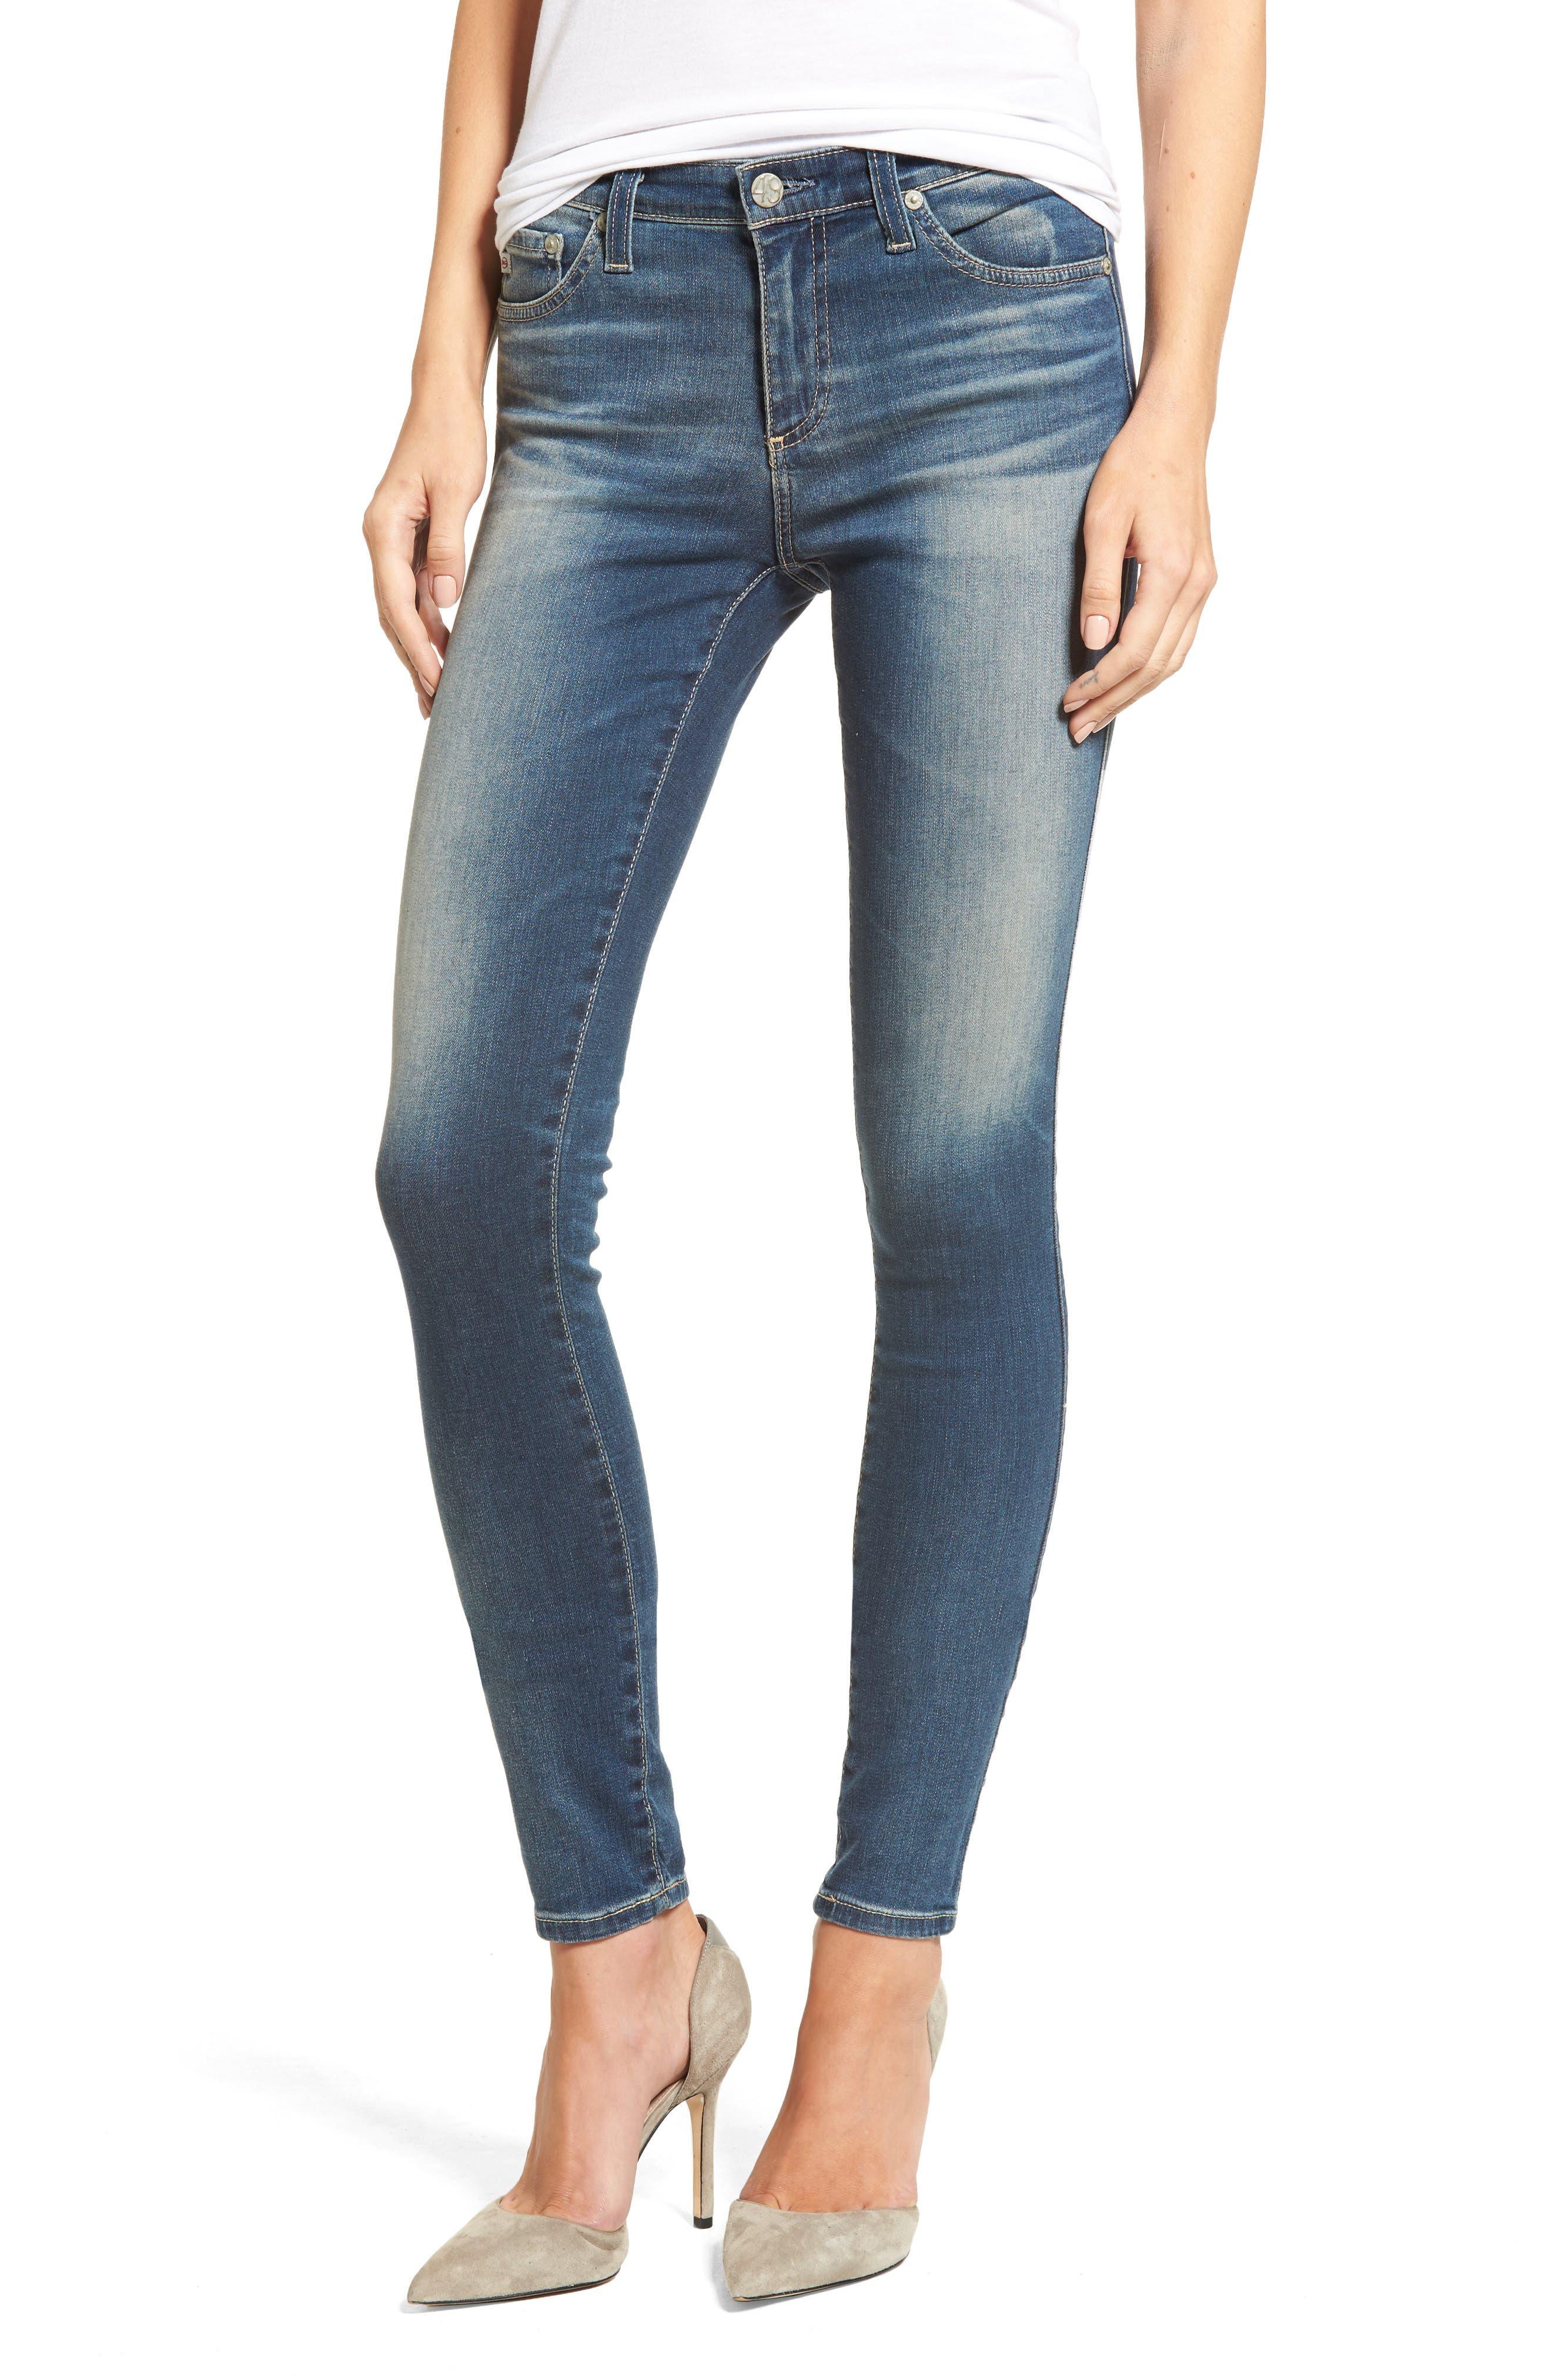 Alternate Image 1 Selected - AG The Legging Super Skinny Jeans (12 Years Abide)